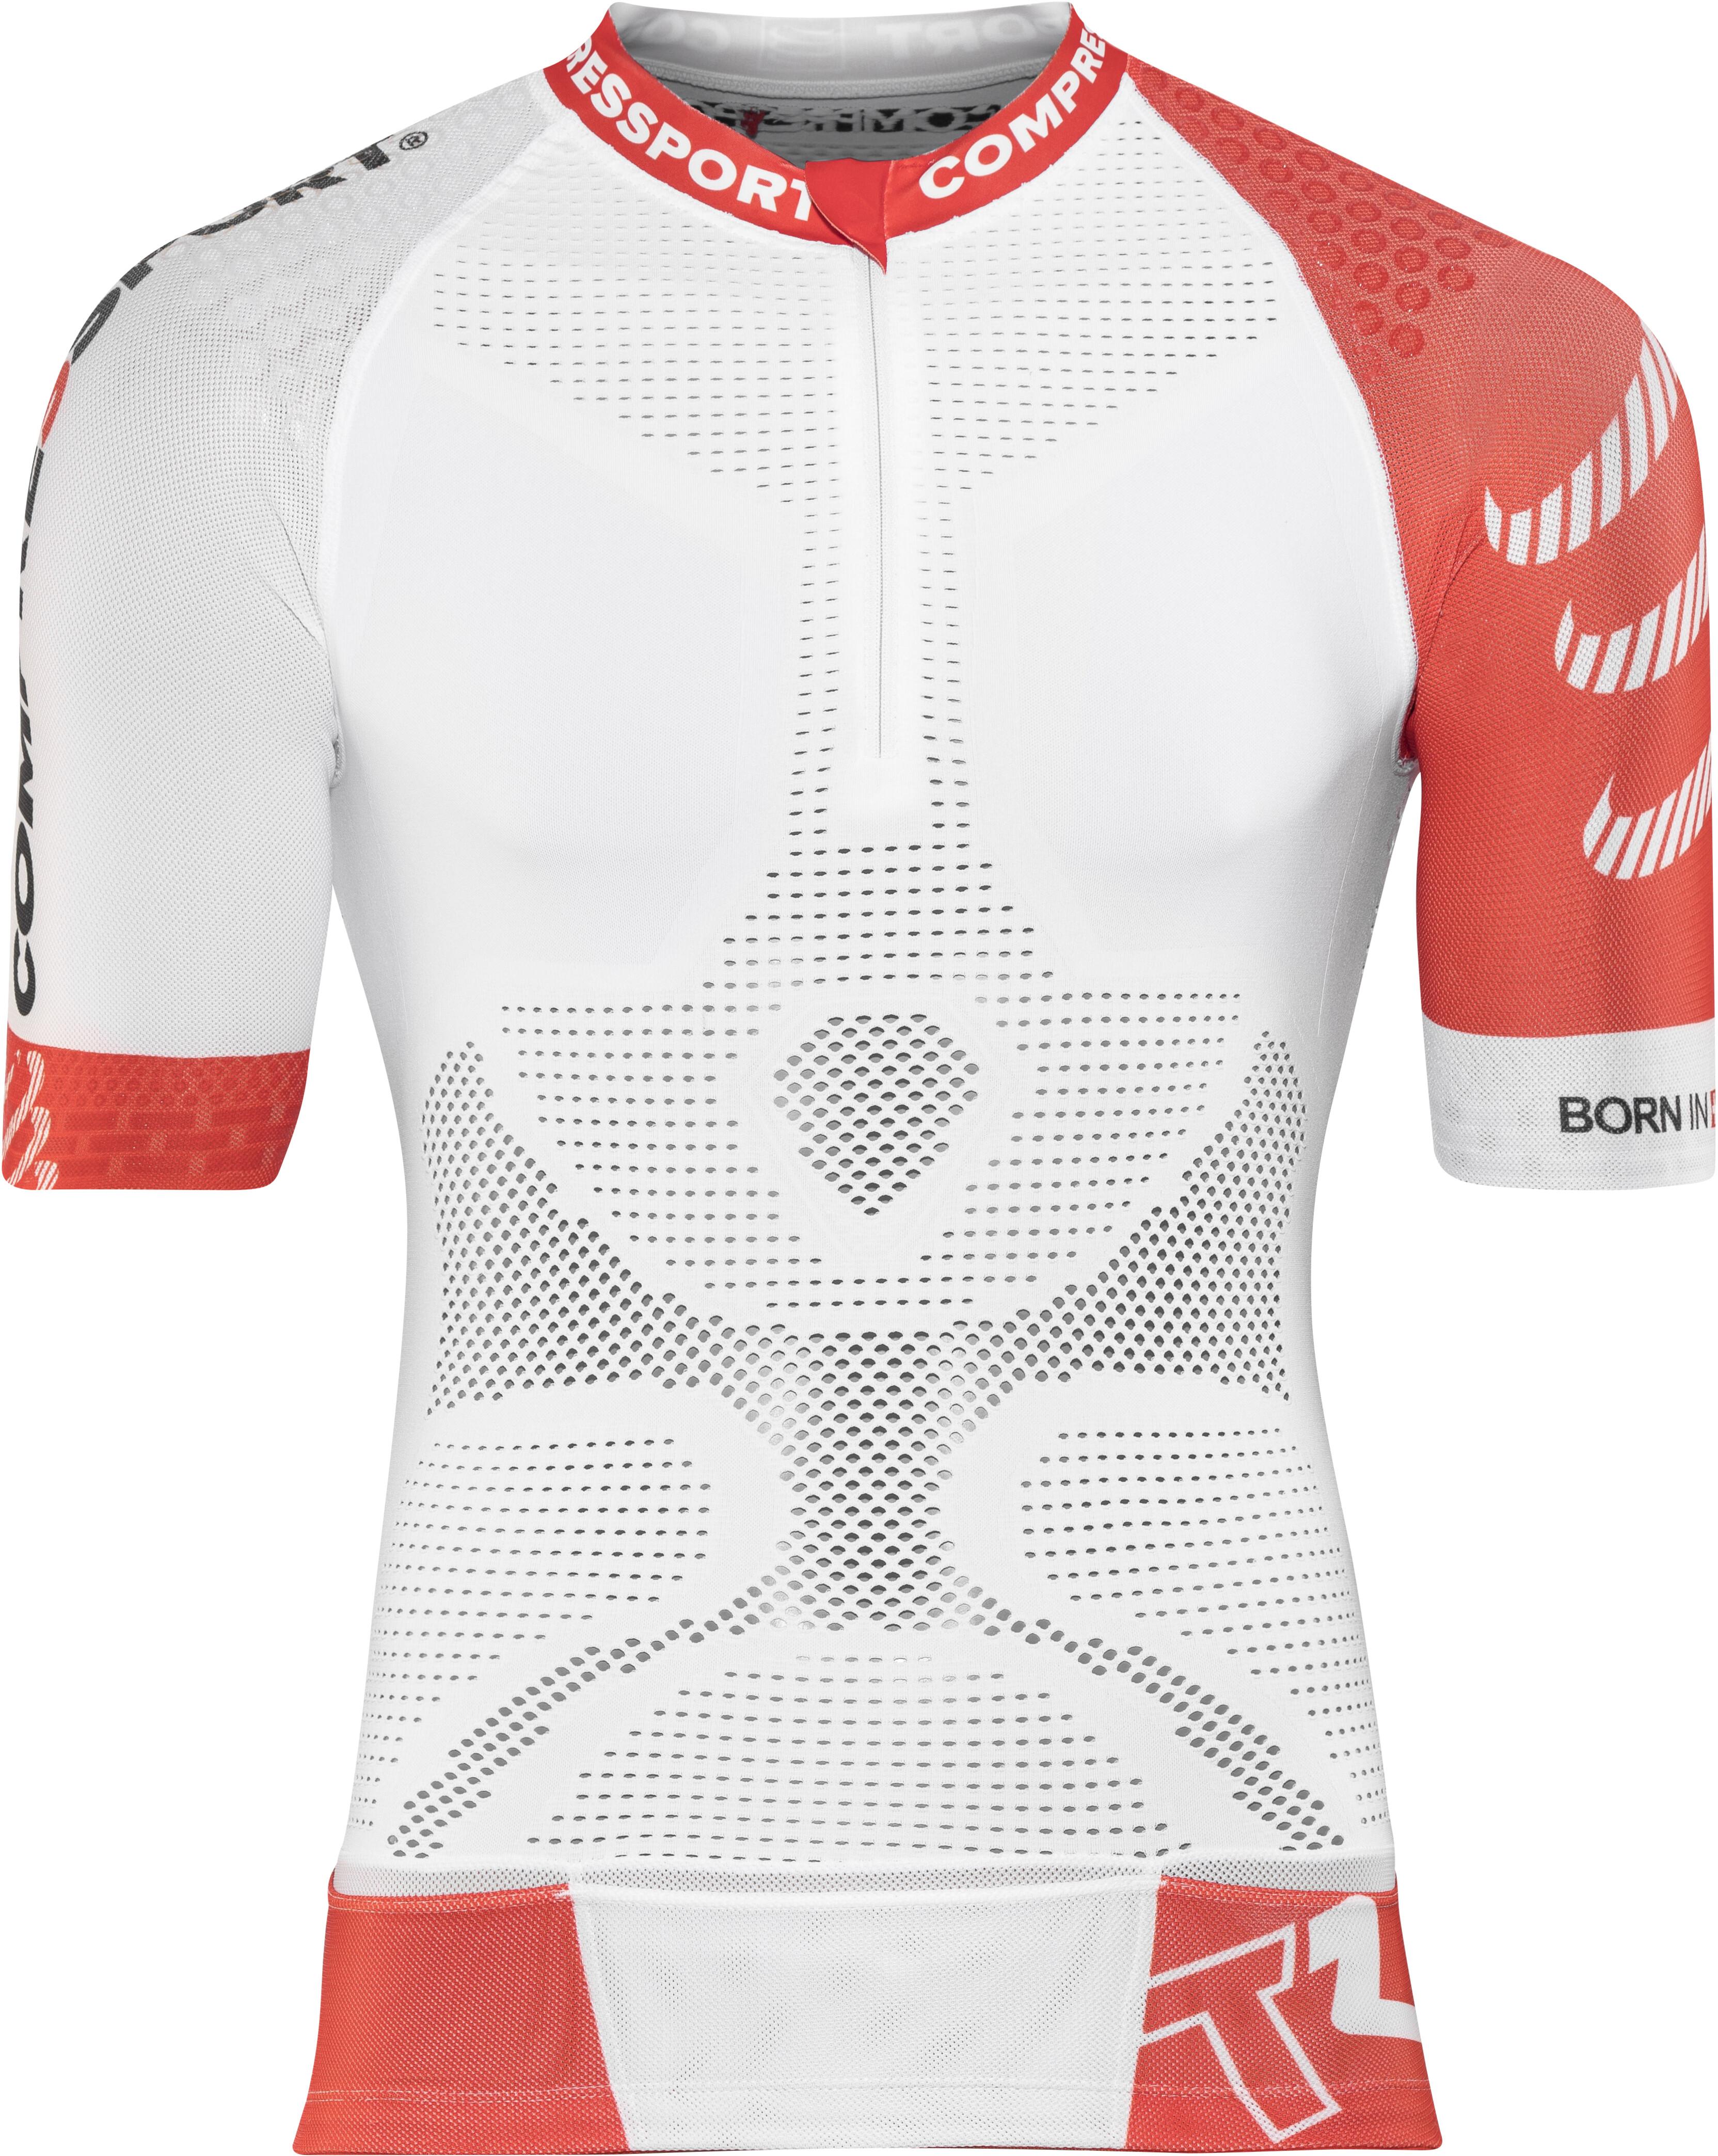 cae173a21d Compressport Trail Running V2 - Camiseta Running Hombre - rojo/blanco